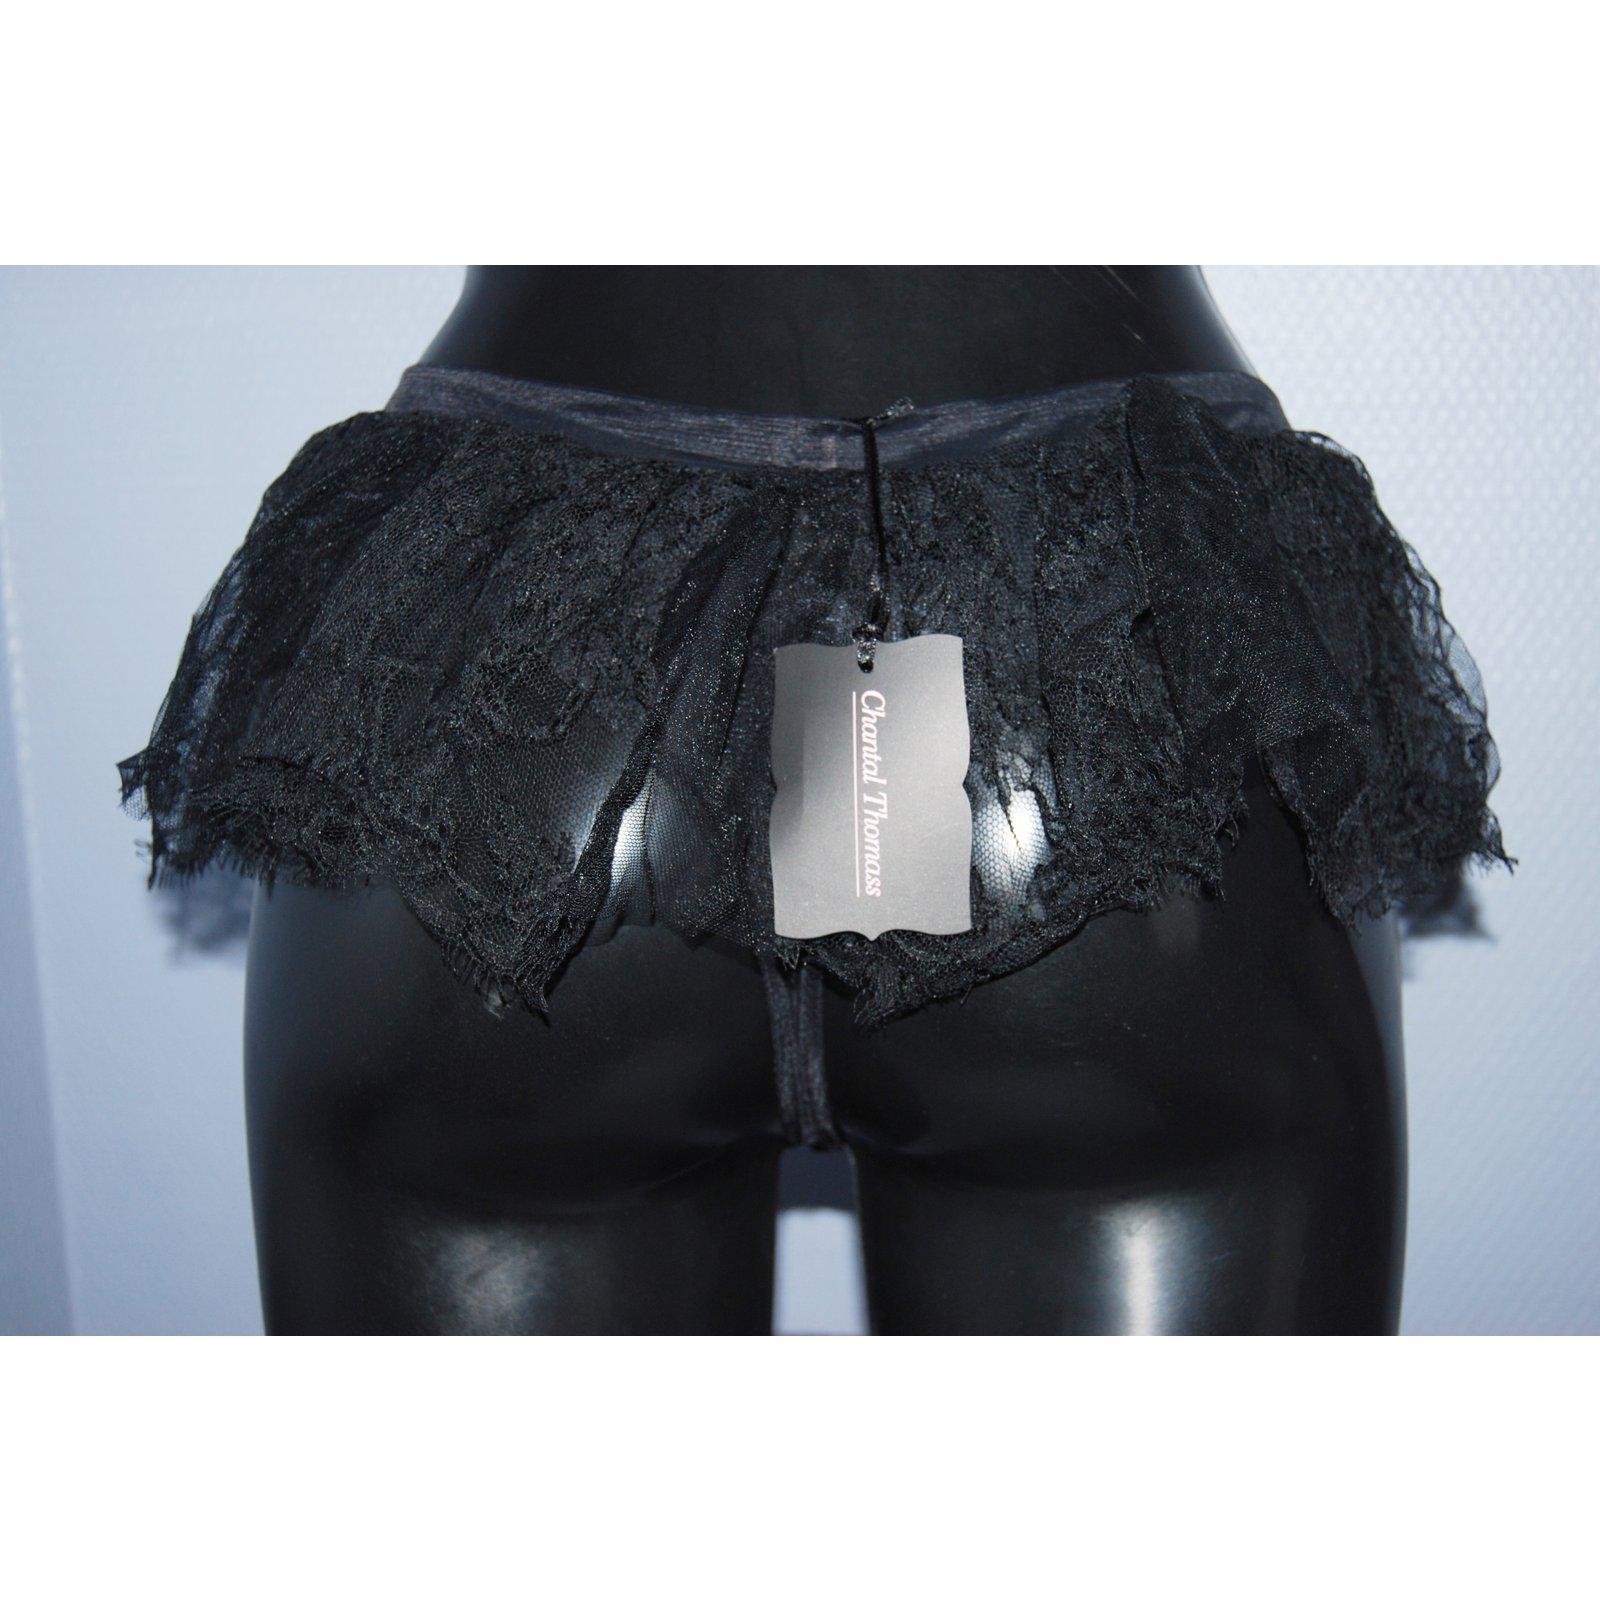 La Perla Intimates Intimates Polyester Black ref.35082 - Joli Closet a8f6665ac